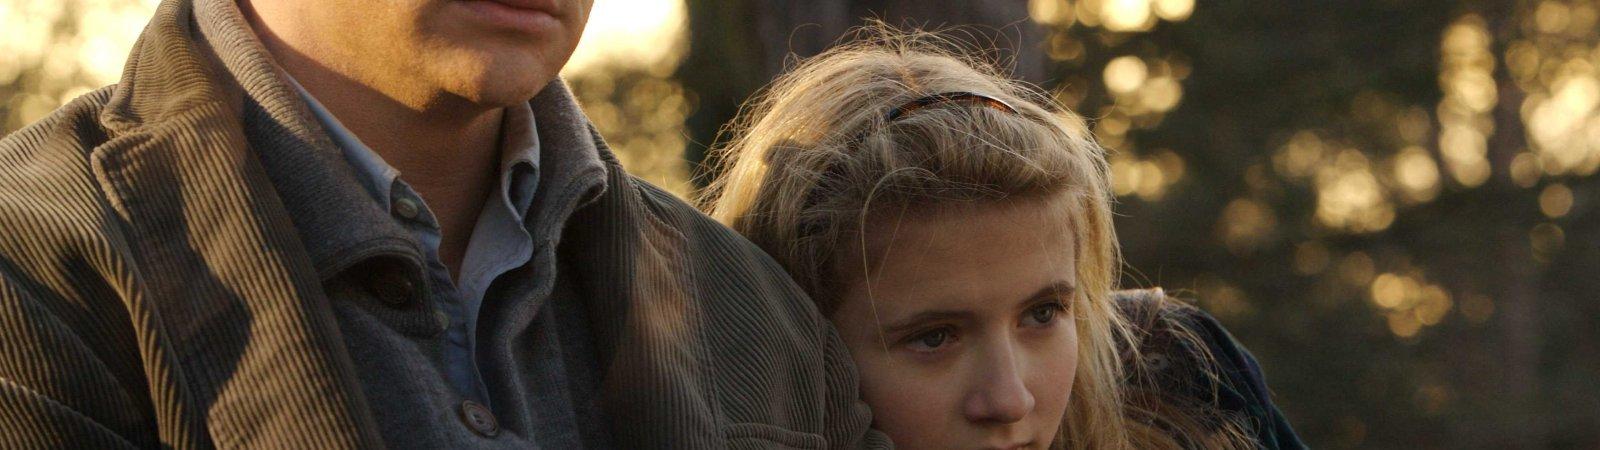 Photo dernier film Iain Softley